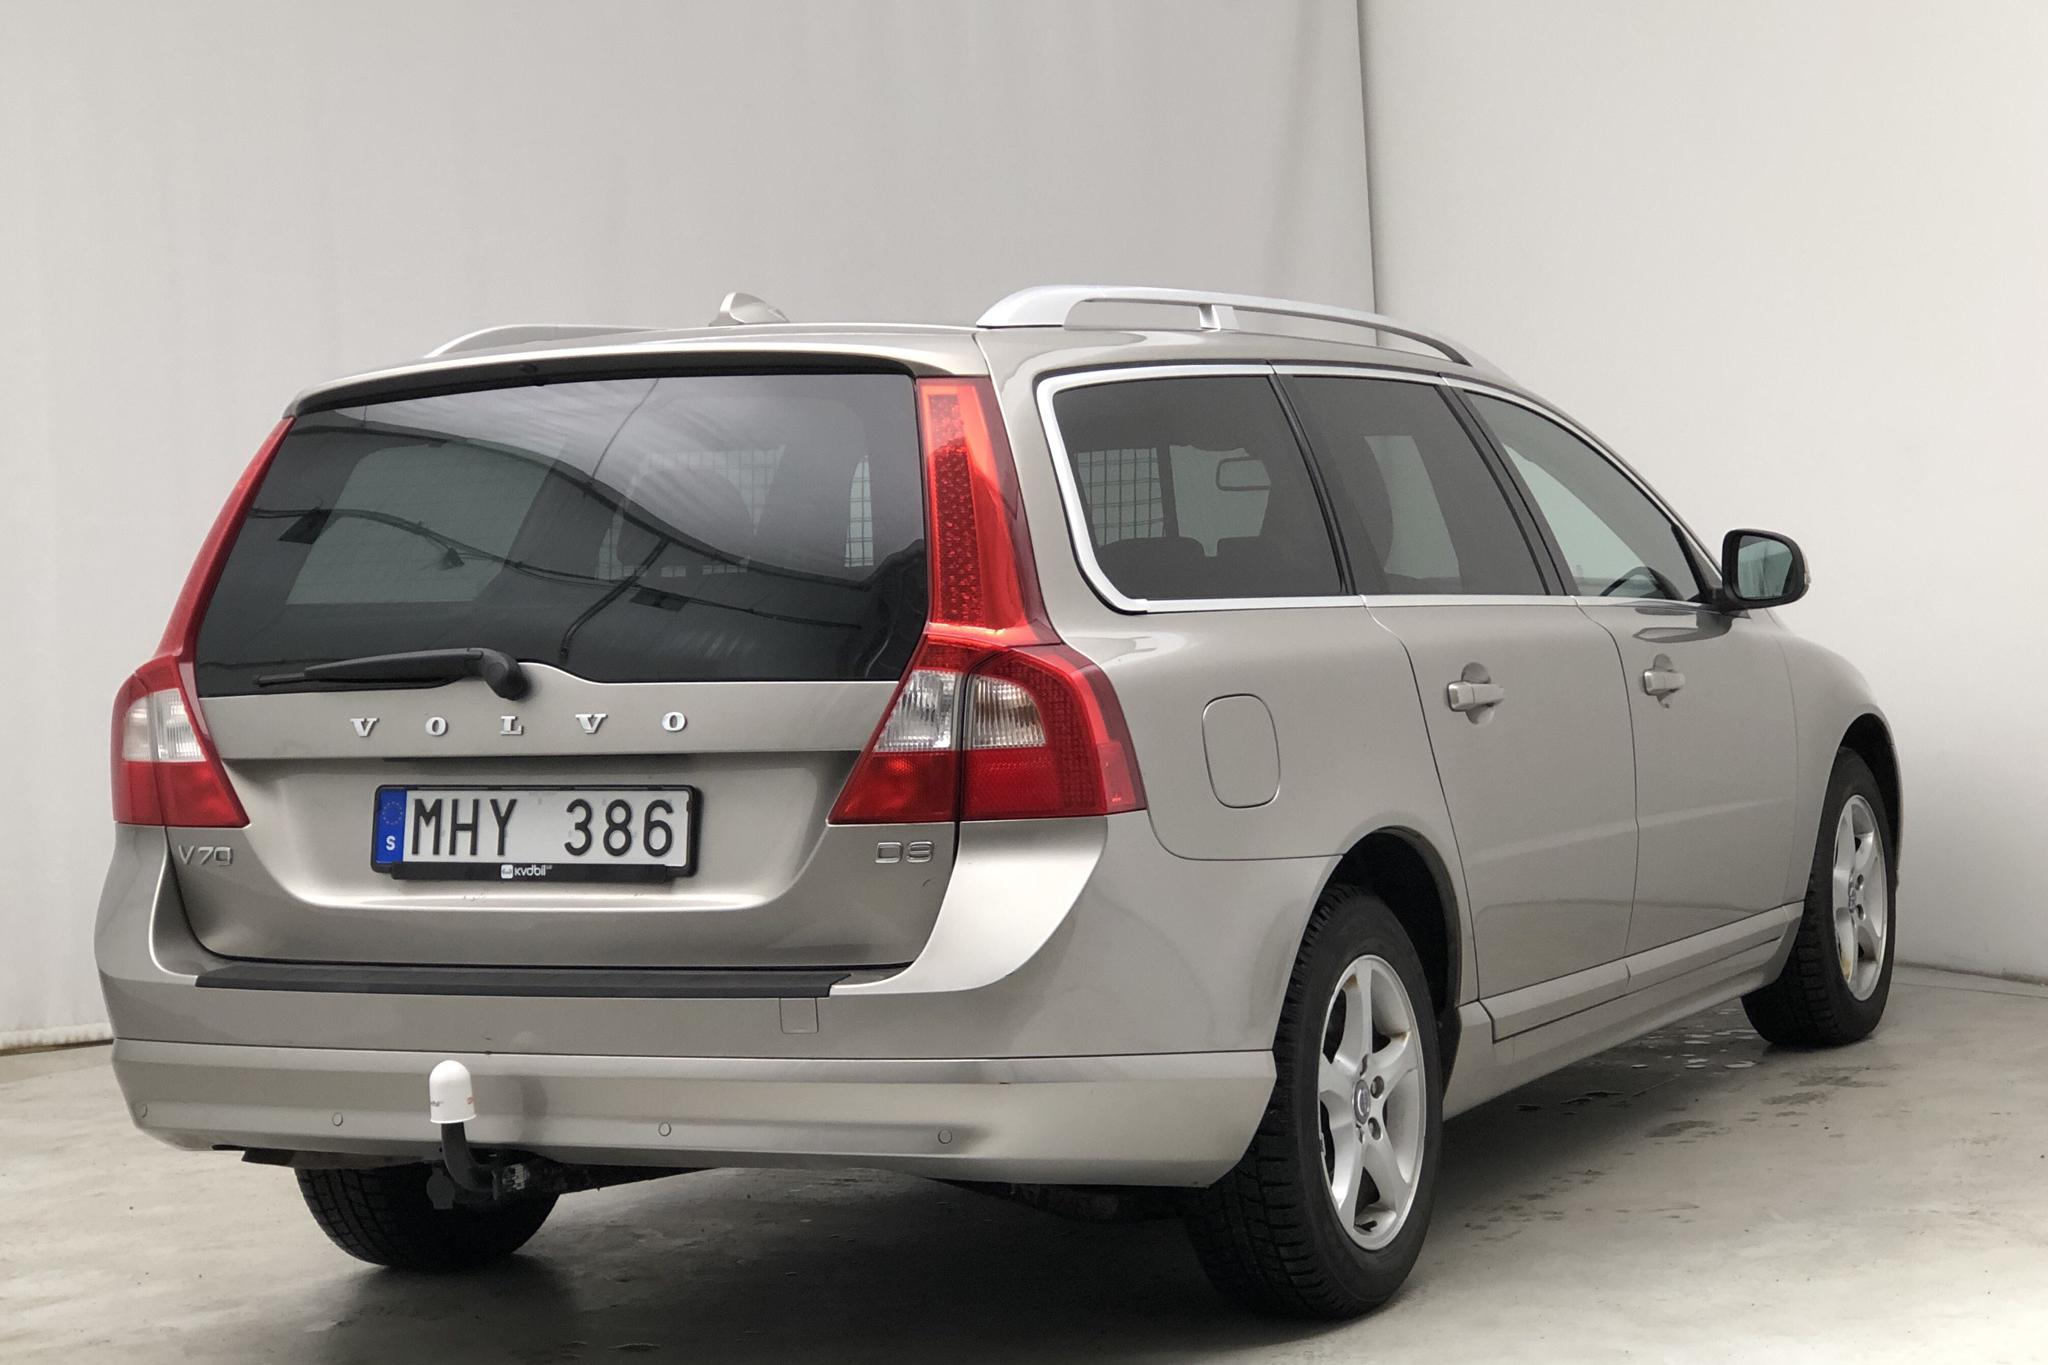 Volvo V70 II D3 (163hk) - 243 120 km - Automatic - Light Brown - 2012